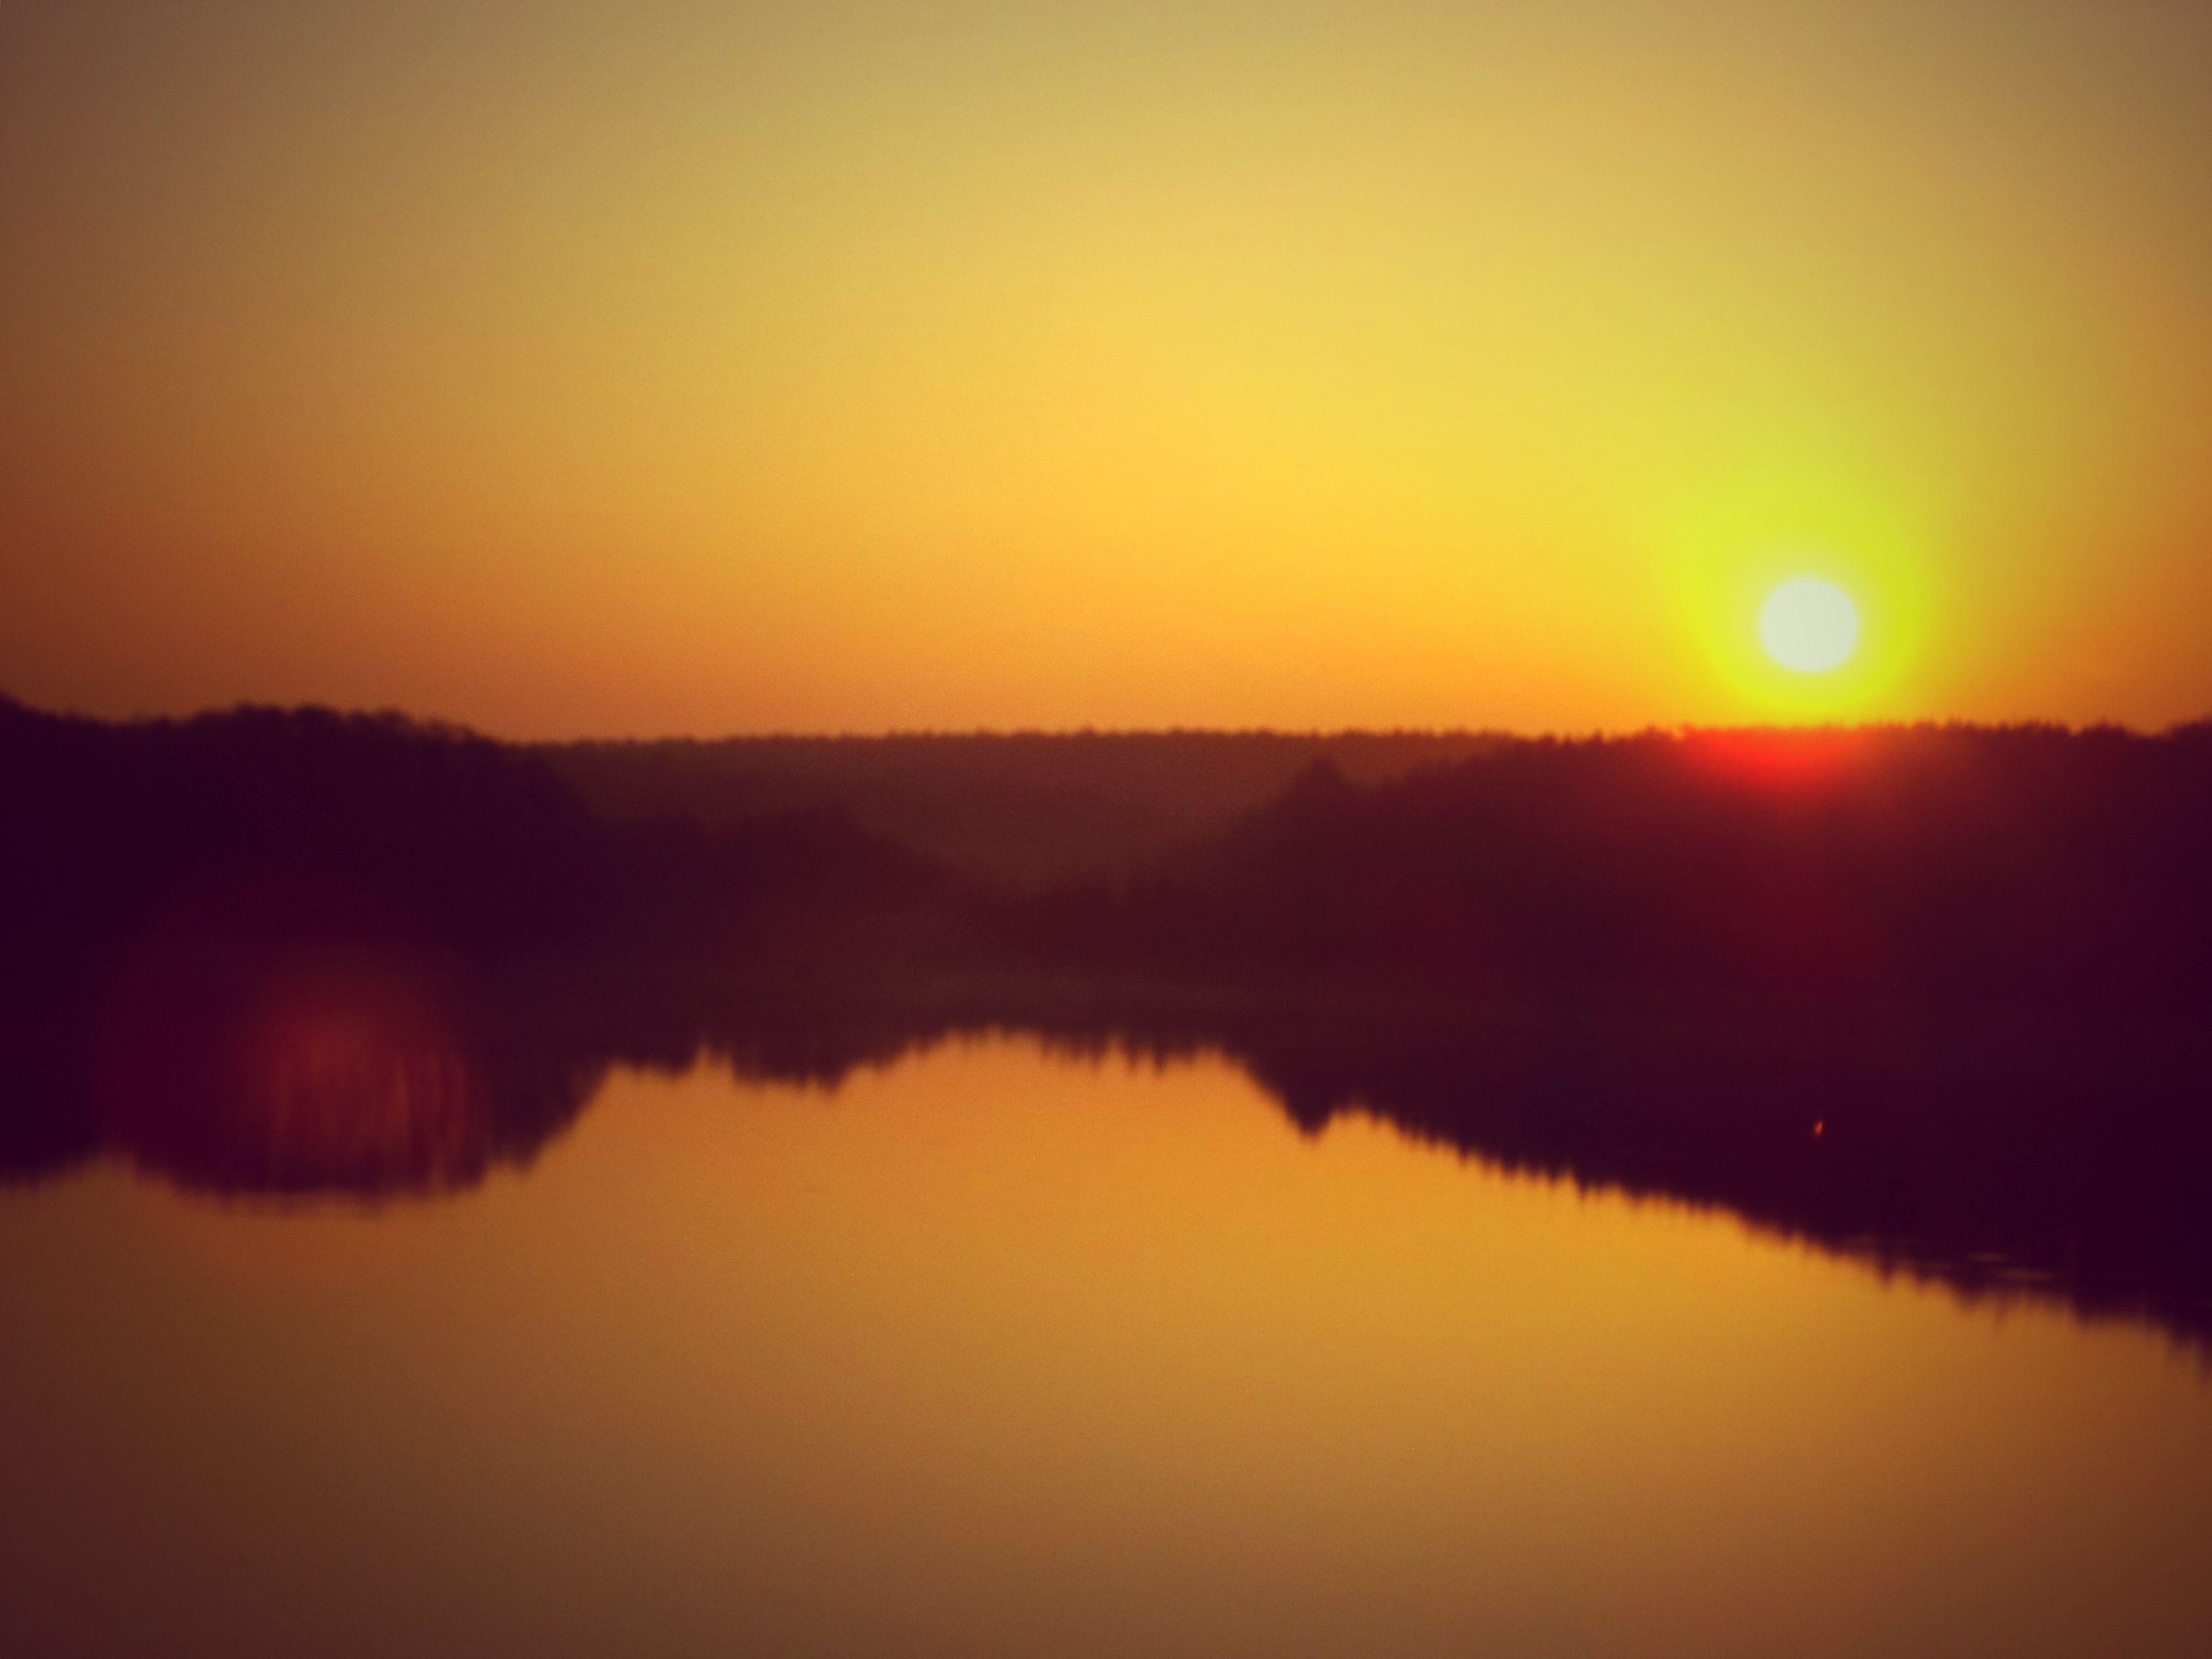 Galerie   Natur im Herbst • ABC   Natur, Abc, Sonnenaufgang